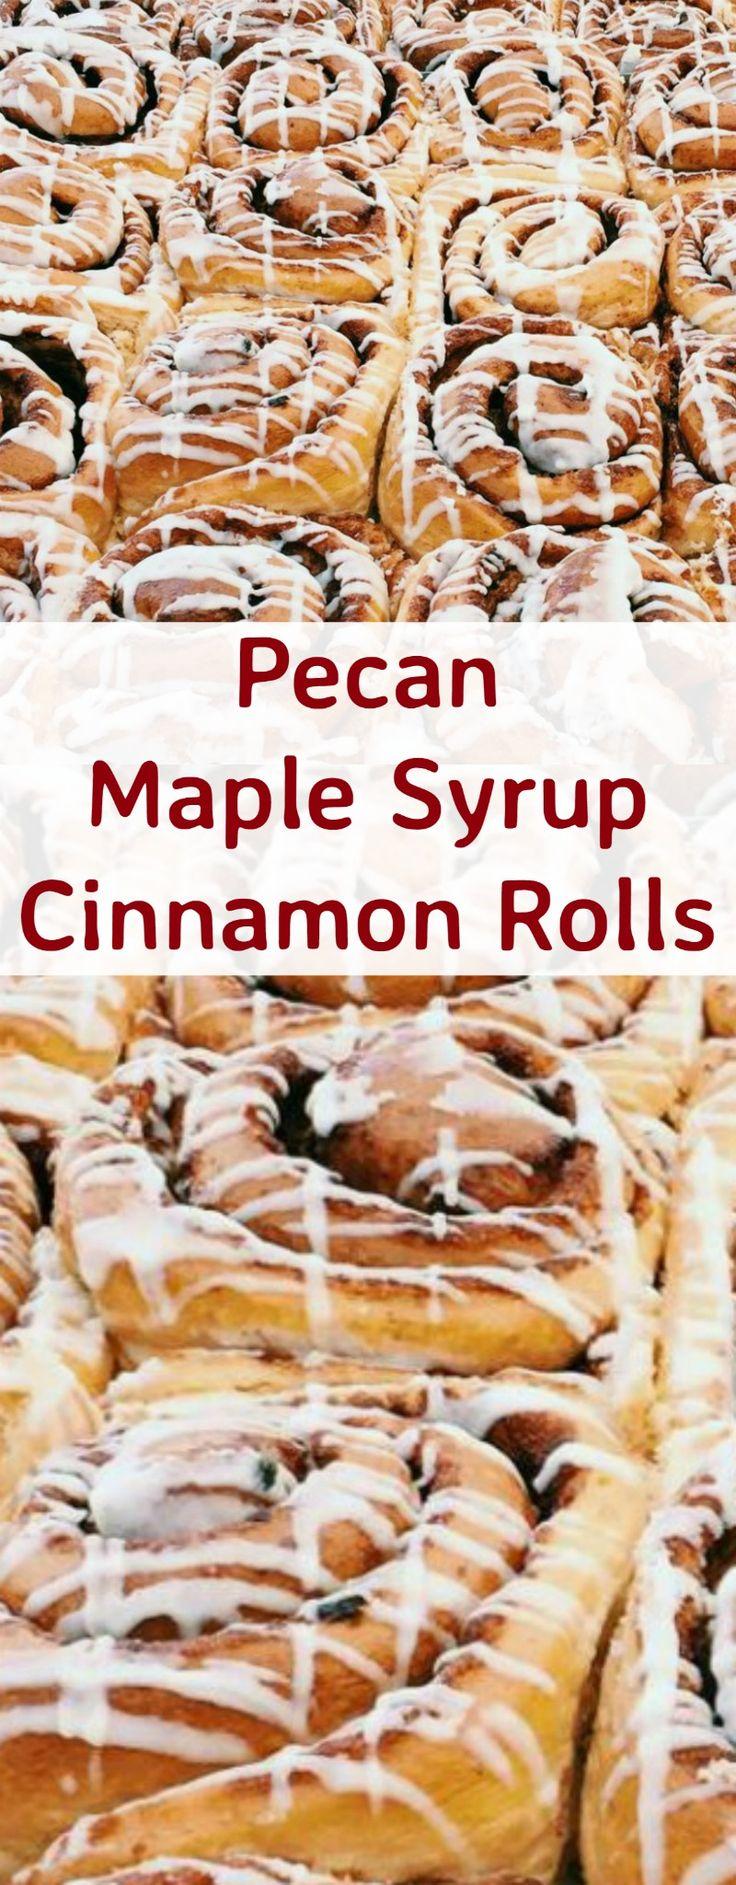 CINNAMON ROLLS & ETC : on Pinterest   Blueberry sweet rolls, Buns ...